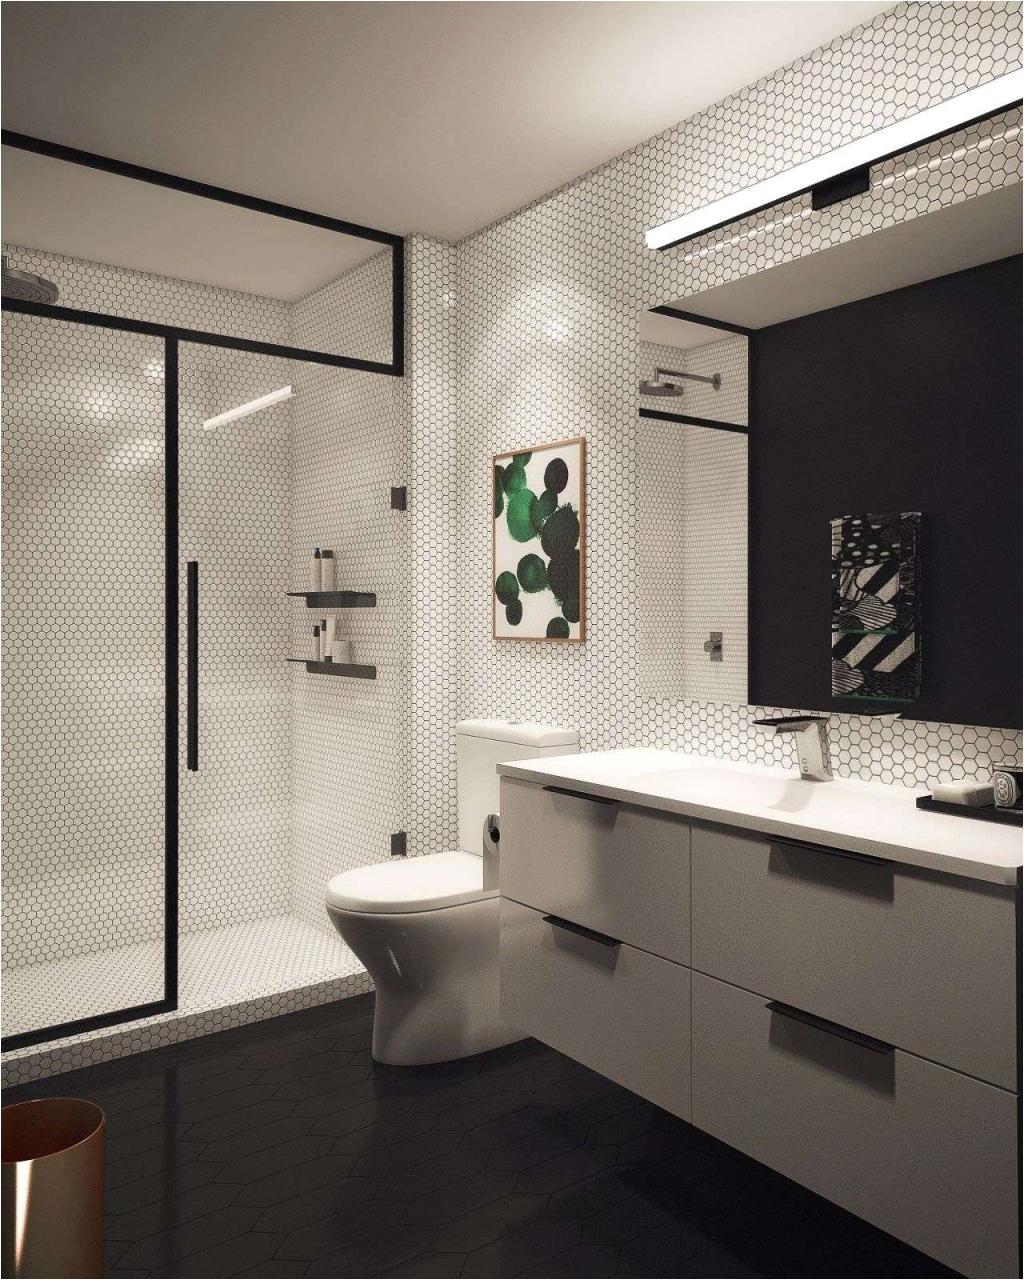 Magnificent Bathroom Wall Tile Ideas For Small Bathrooms Lovely Small Bathroom Lighting Fresh Tag Toilet Ideas